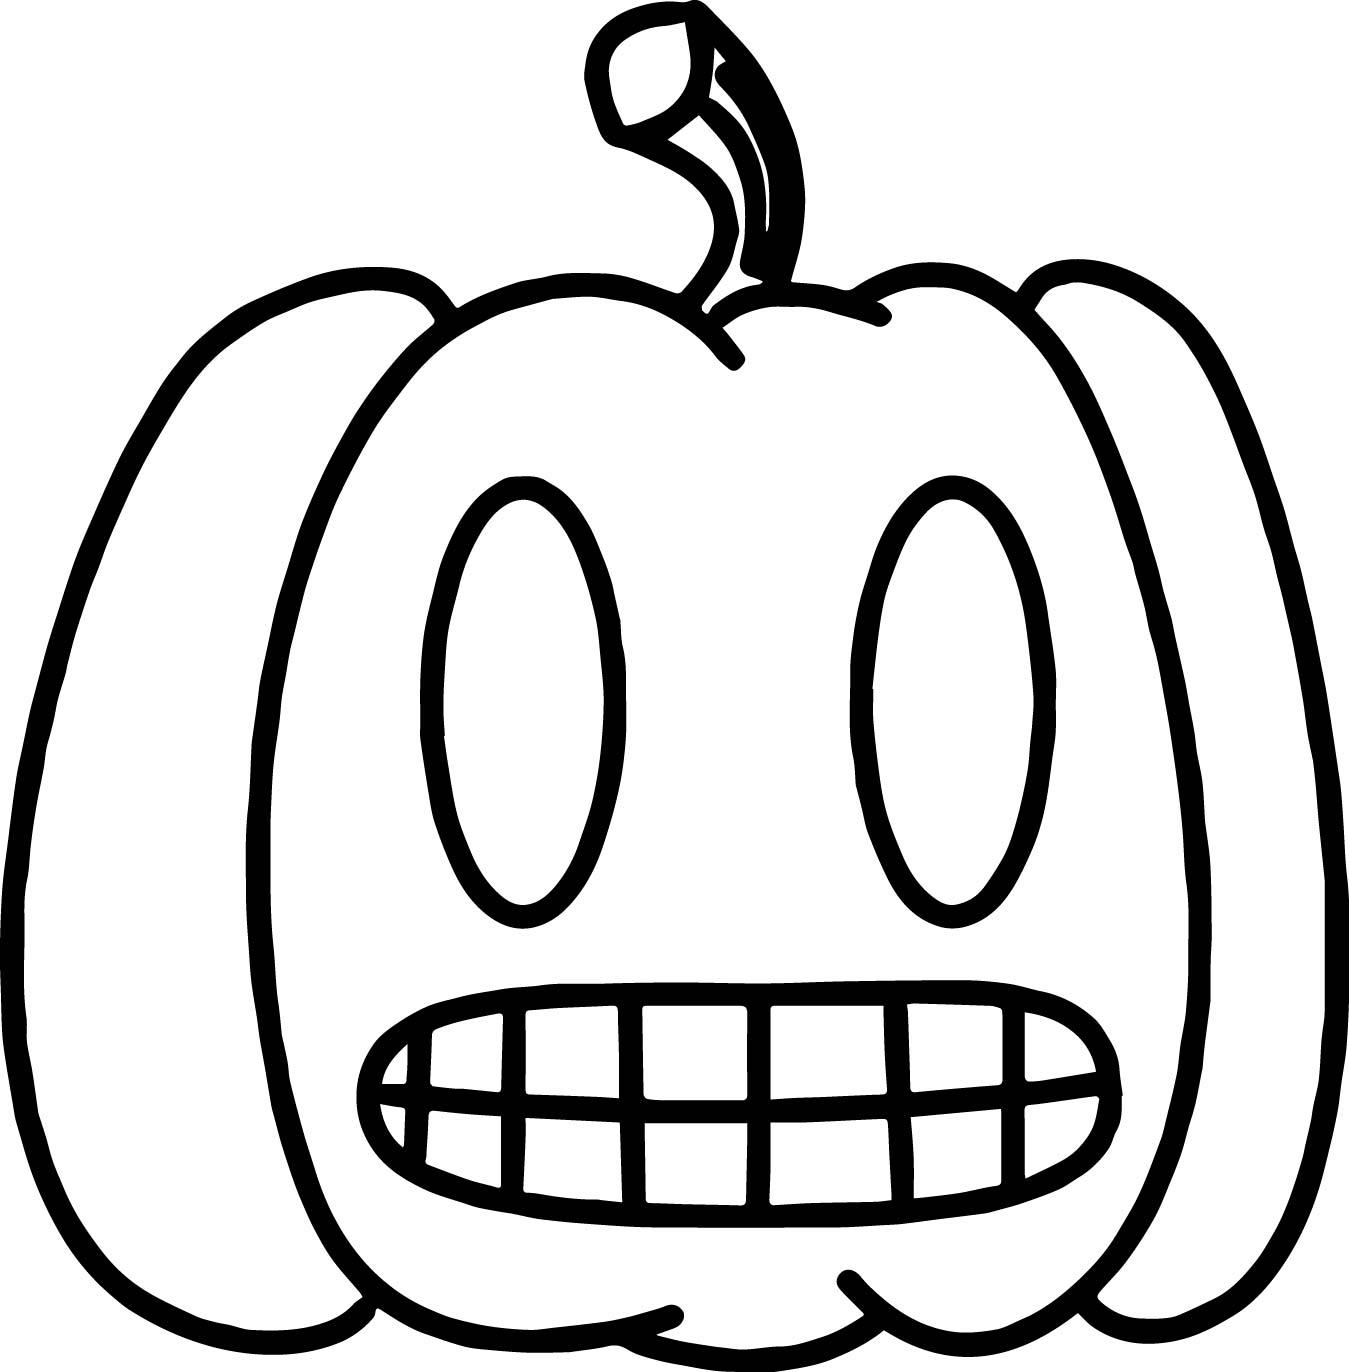 Danny Phantom Pumpkin Coloring Page | Wecoloringpage.com